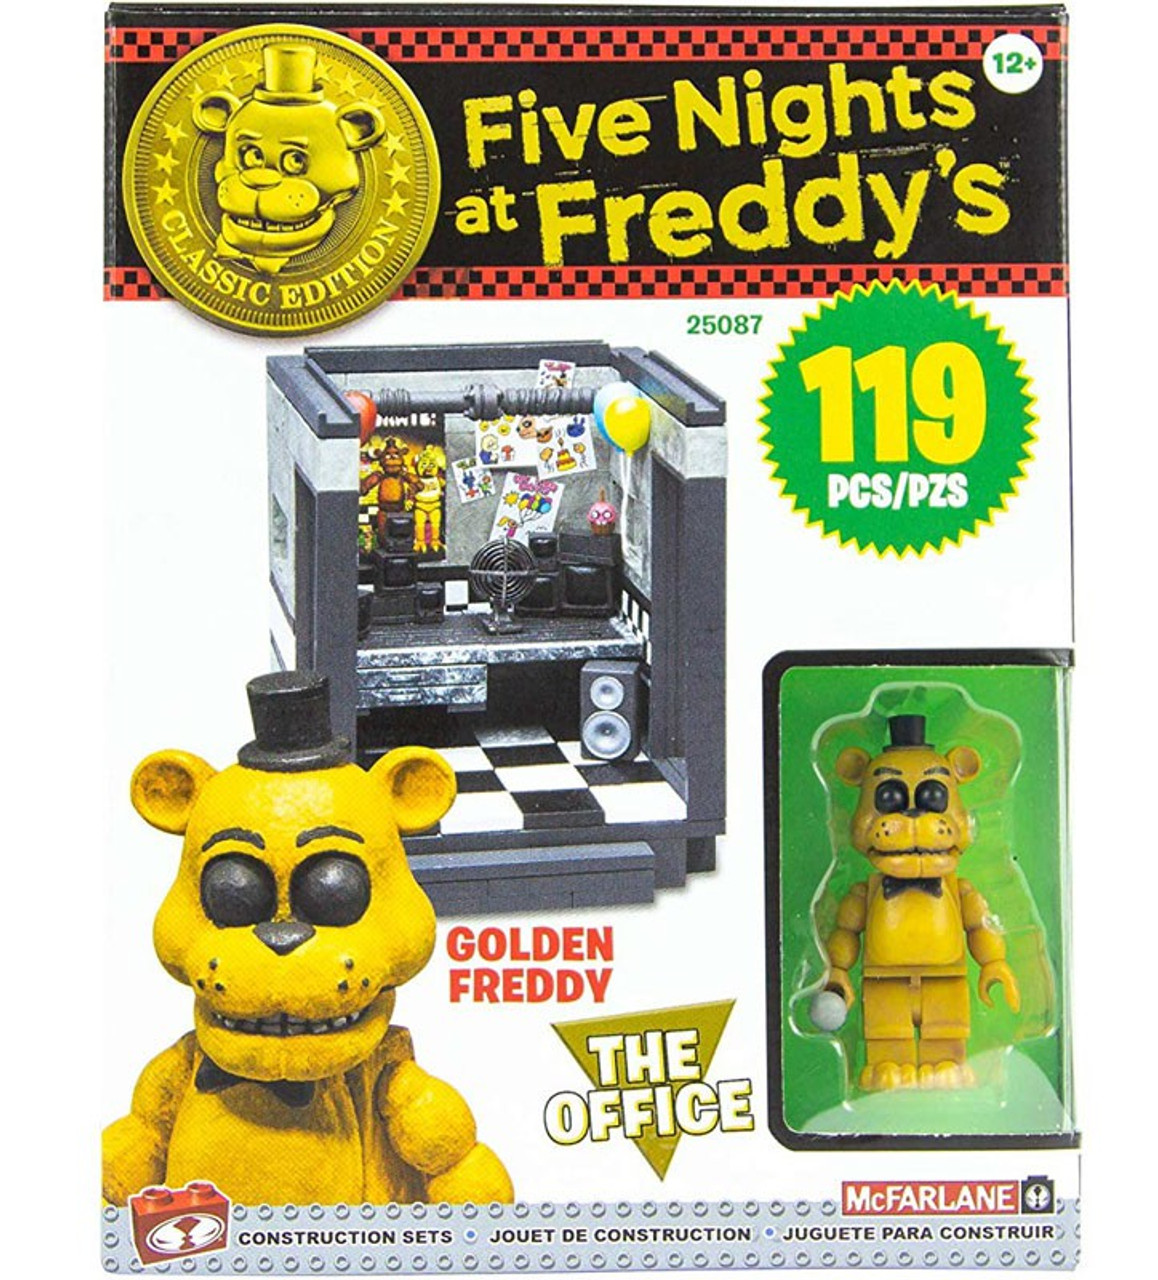 Working Improved Freddy Mask Roblox 8o8tqjdgklrk3m